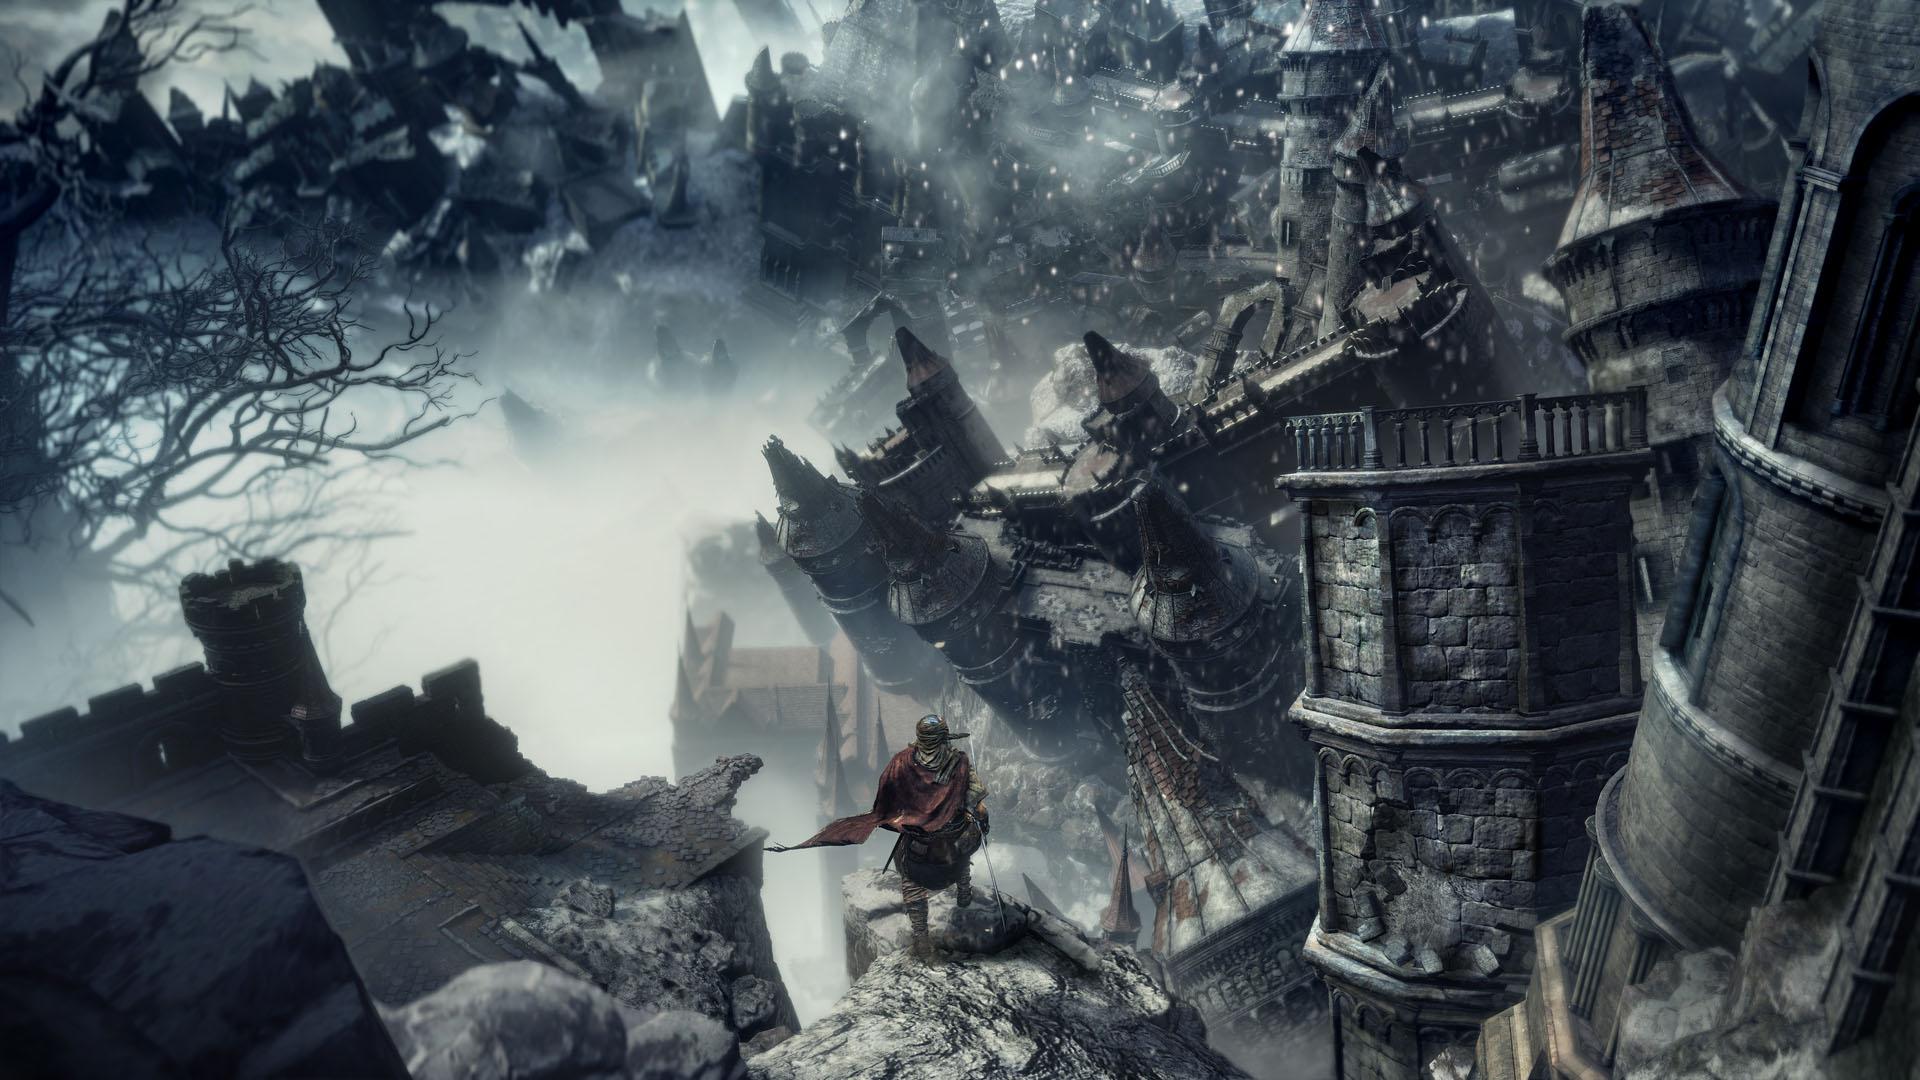 Dark Souls III The Ringed City Setup Free Download